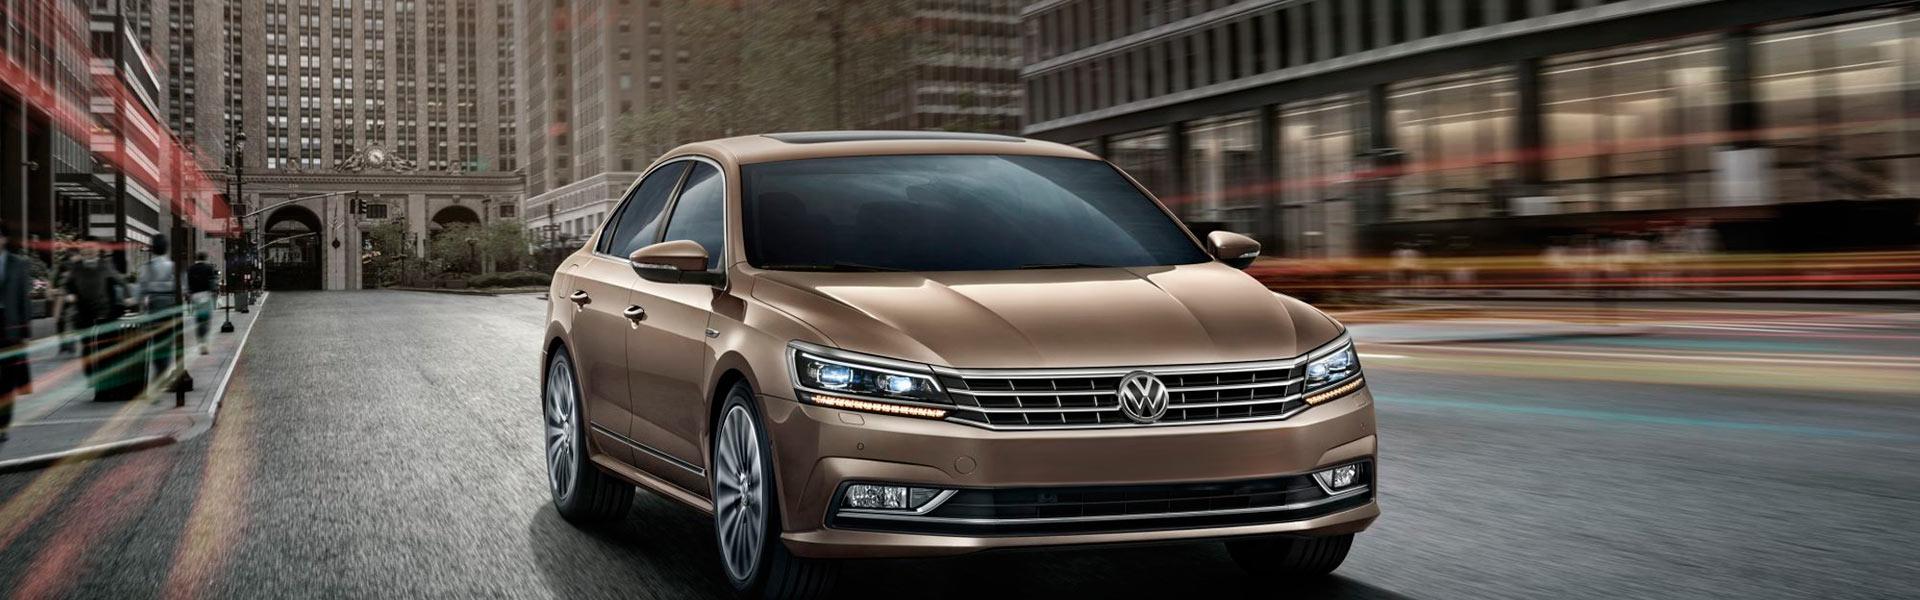 Запчасти на Volkswagen Passat